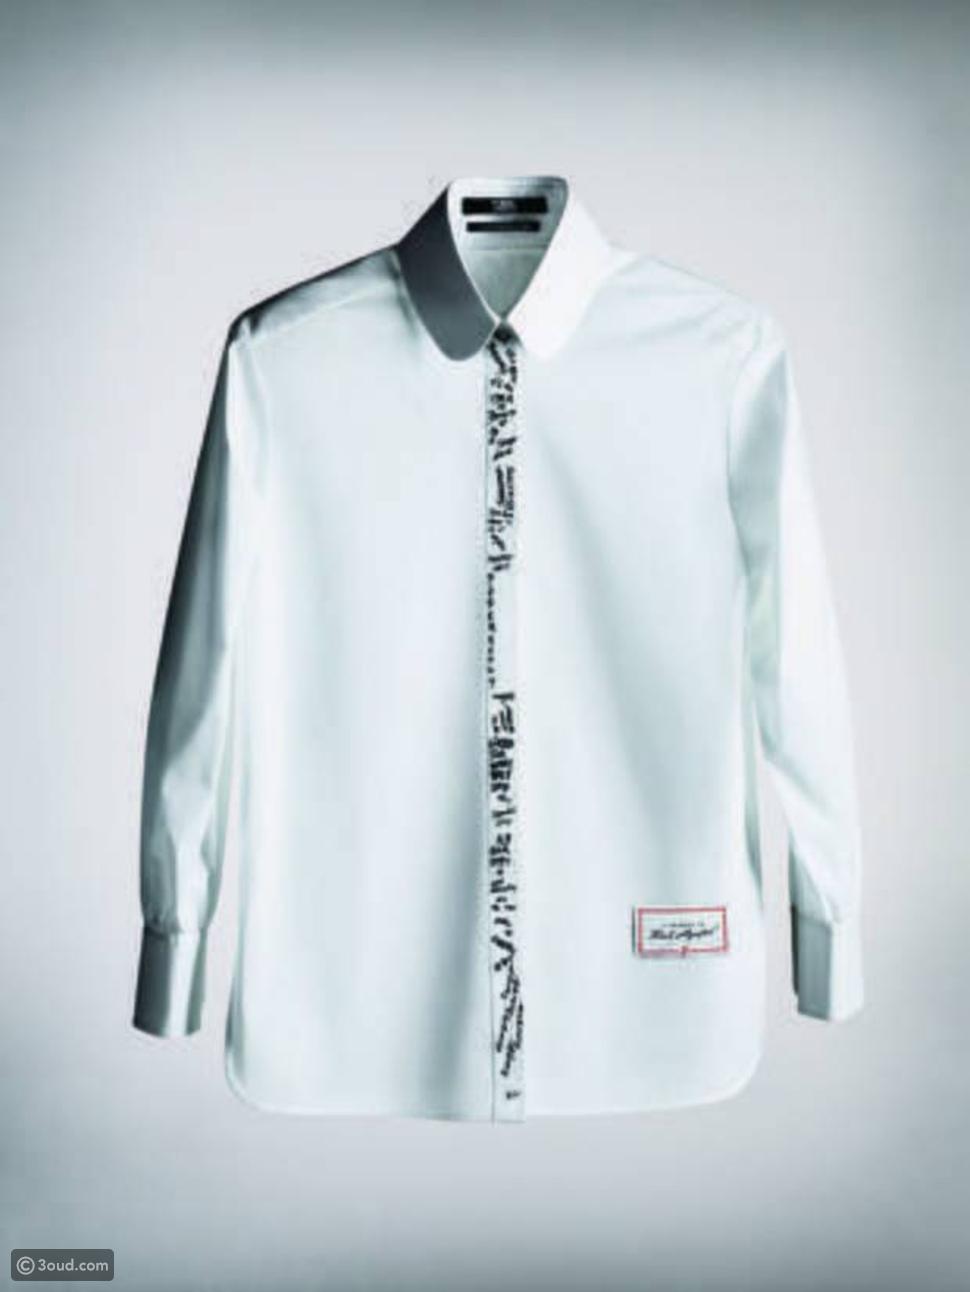 كارا ديليفين وديان كروغر وكايت موس يتنافسن على قميص واحد